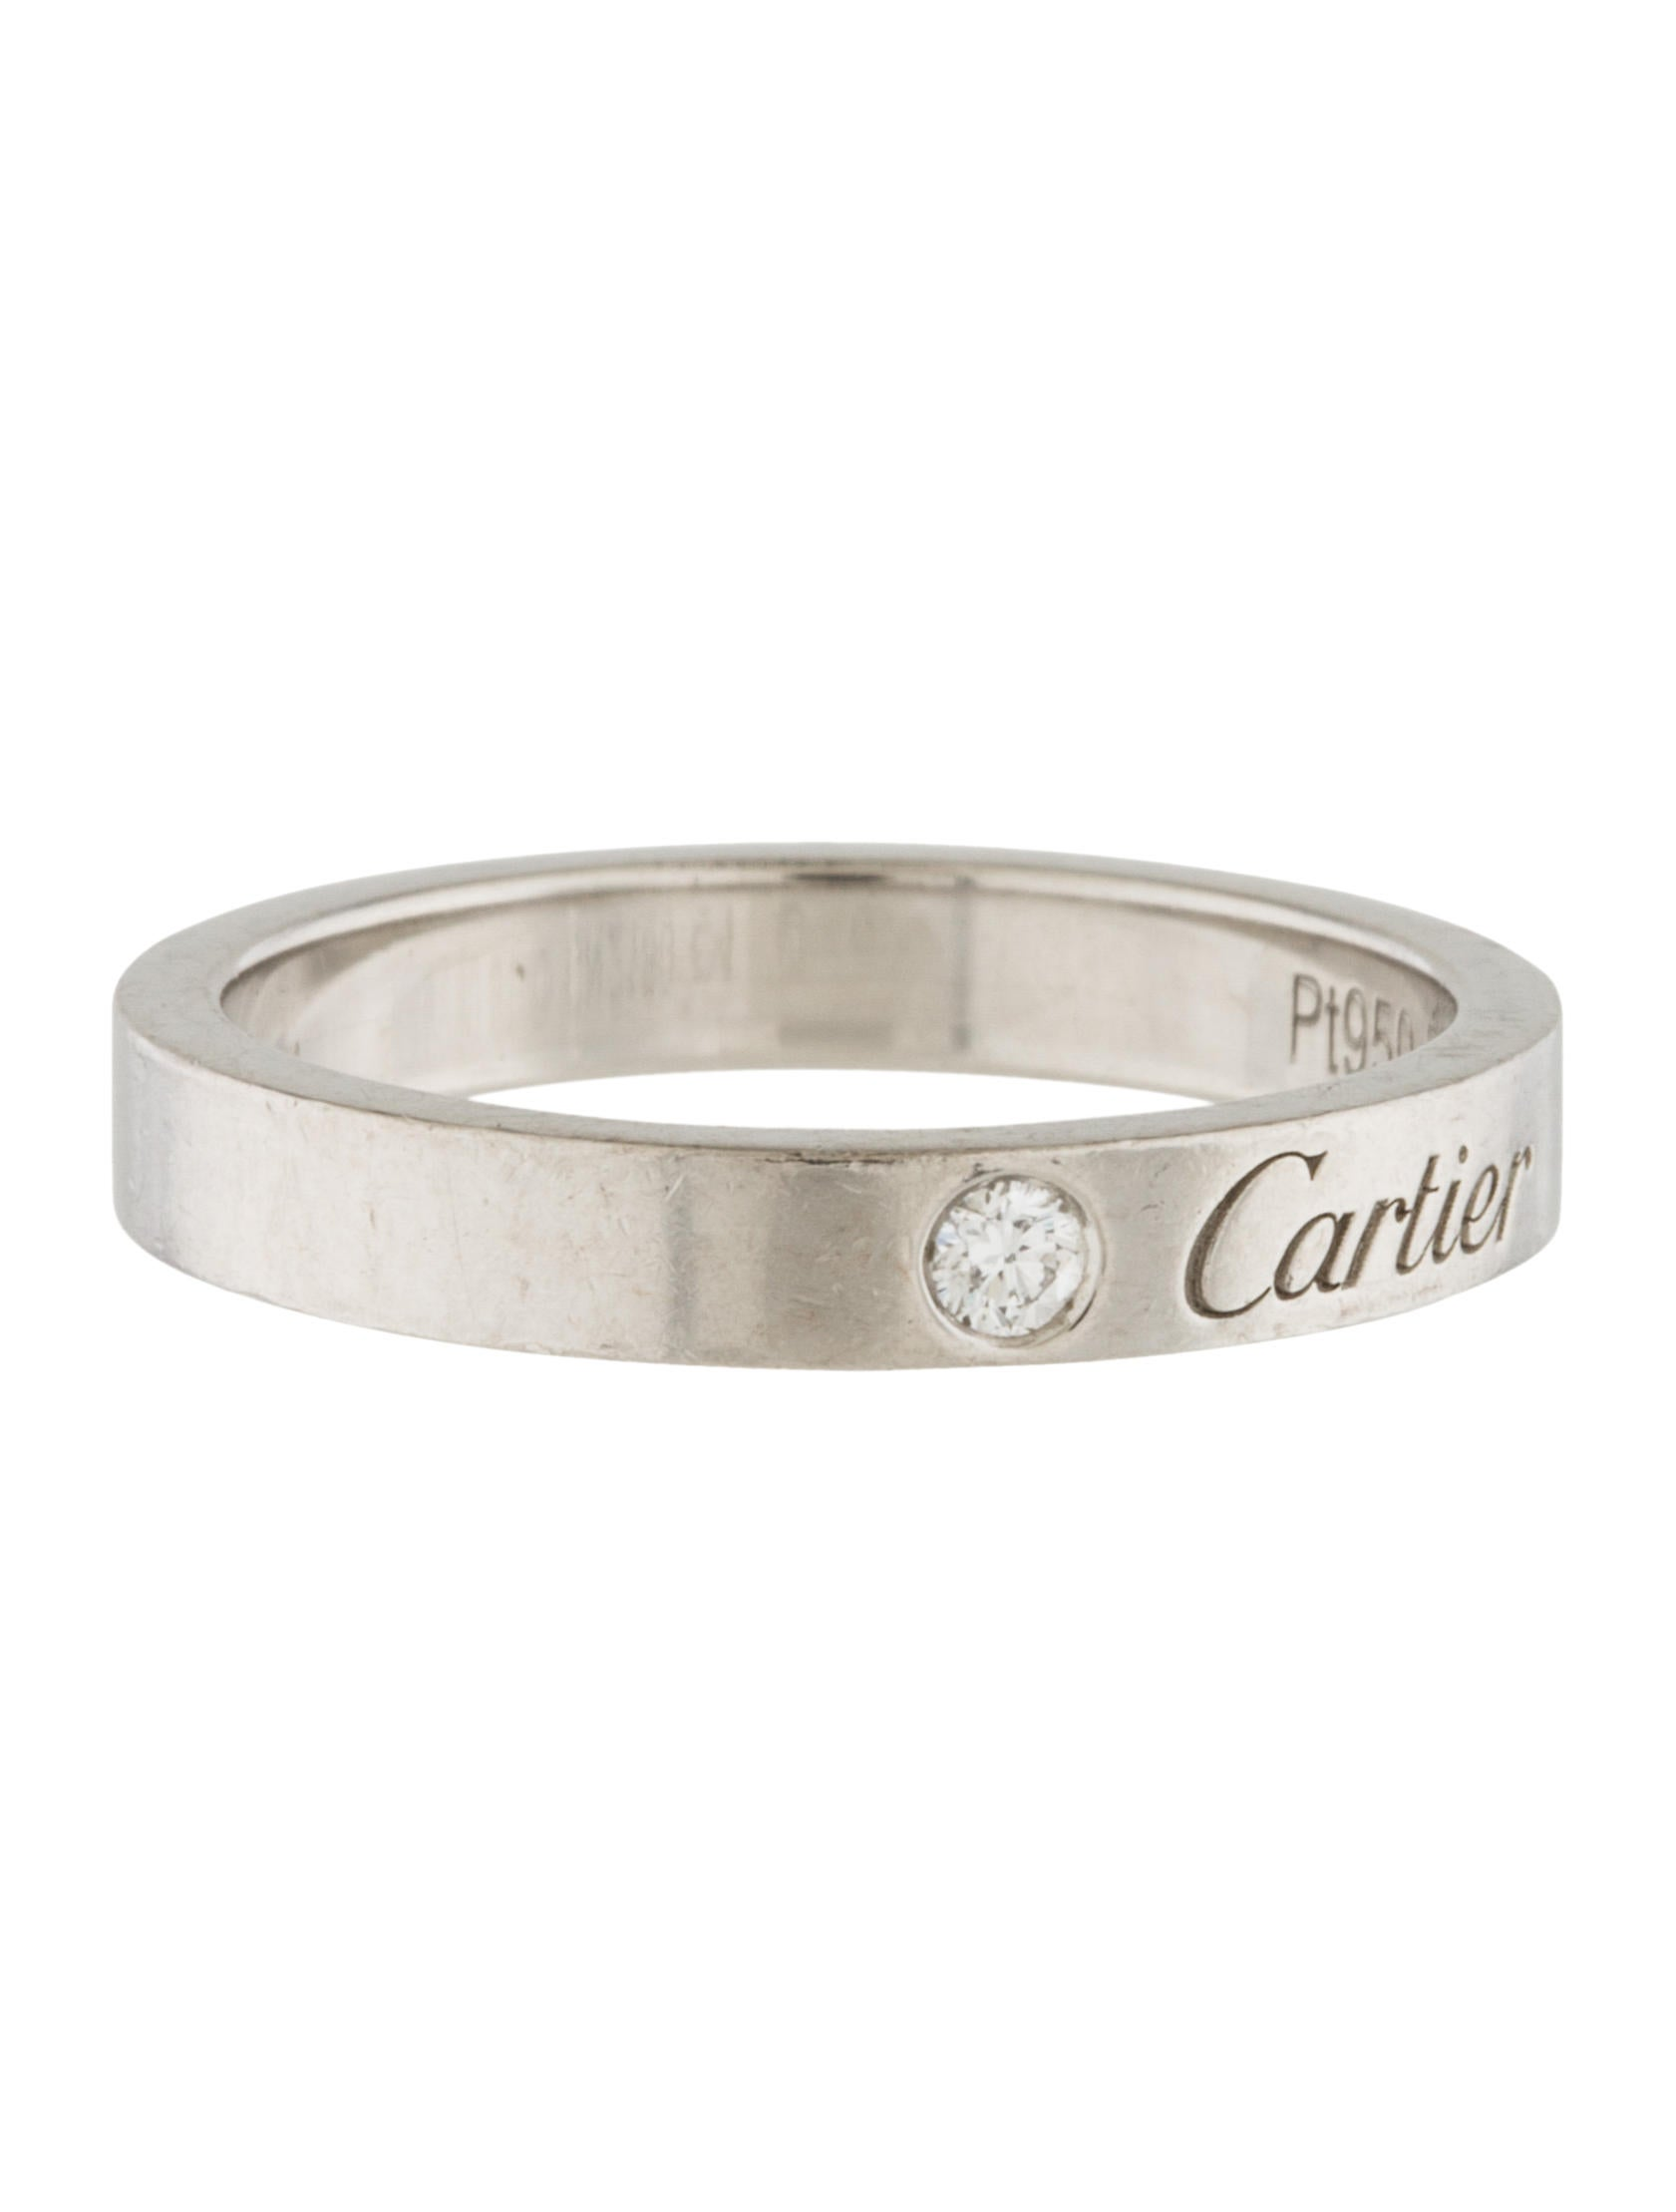 Cartier C de Cartier Wedding Band Rings CRT